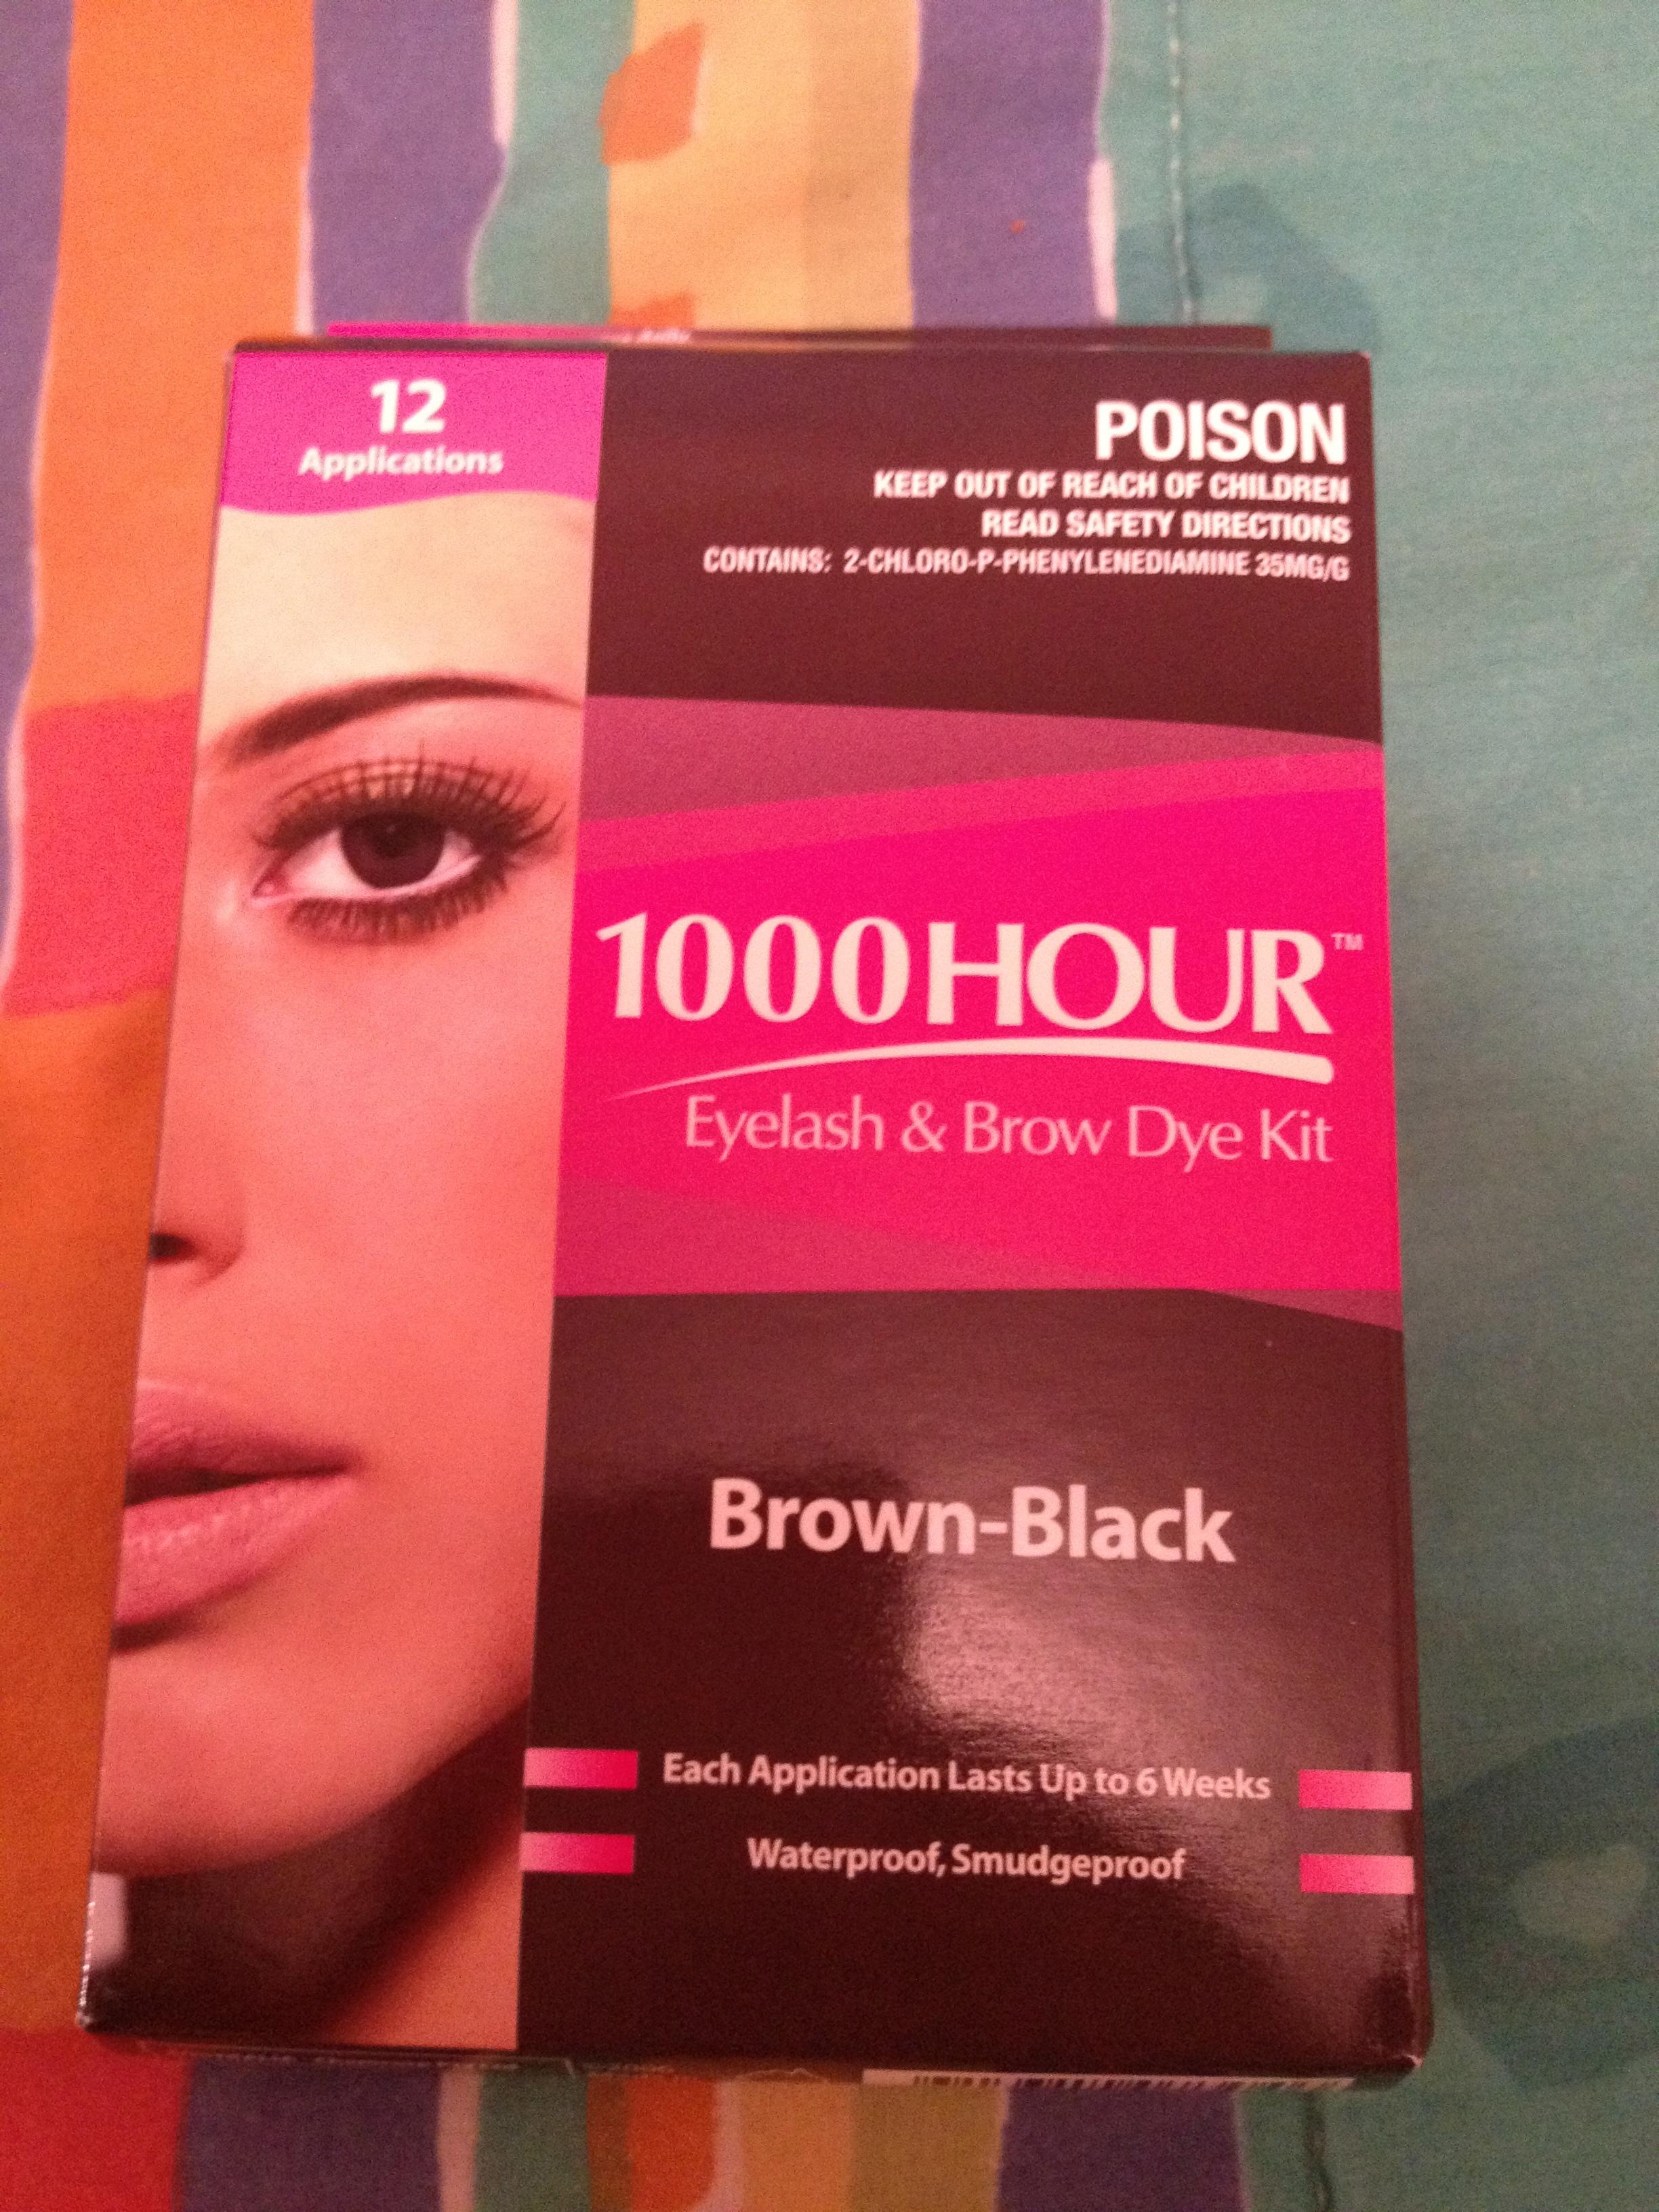 1000 hour eyebrow dye instructions